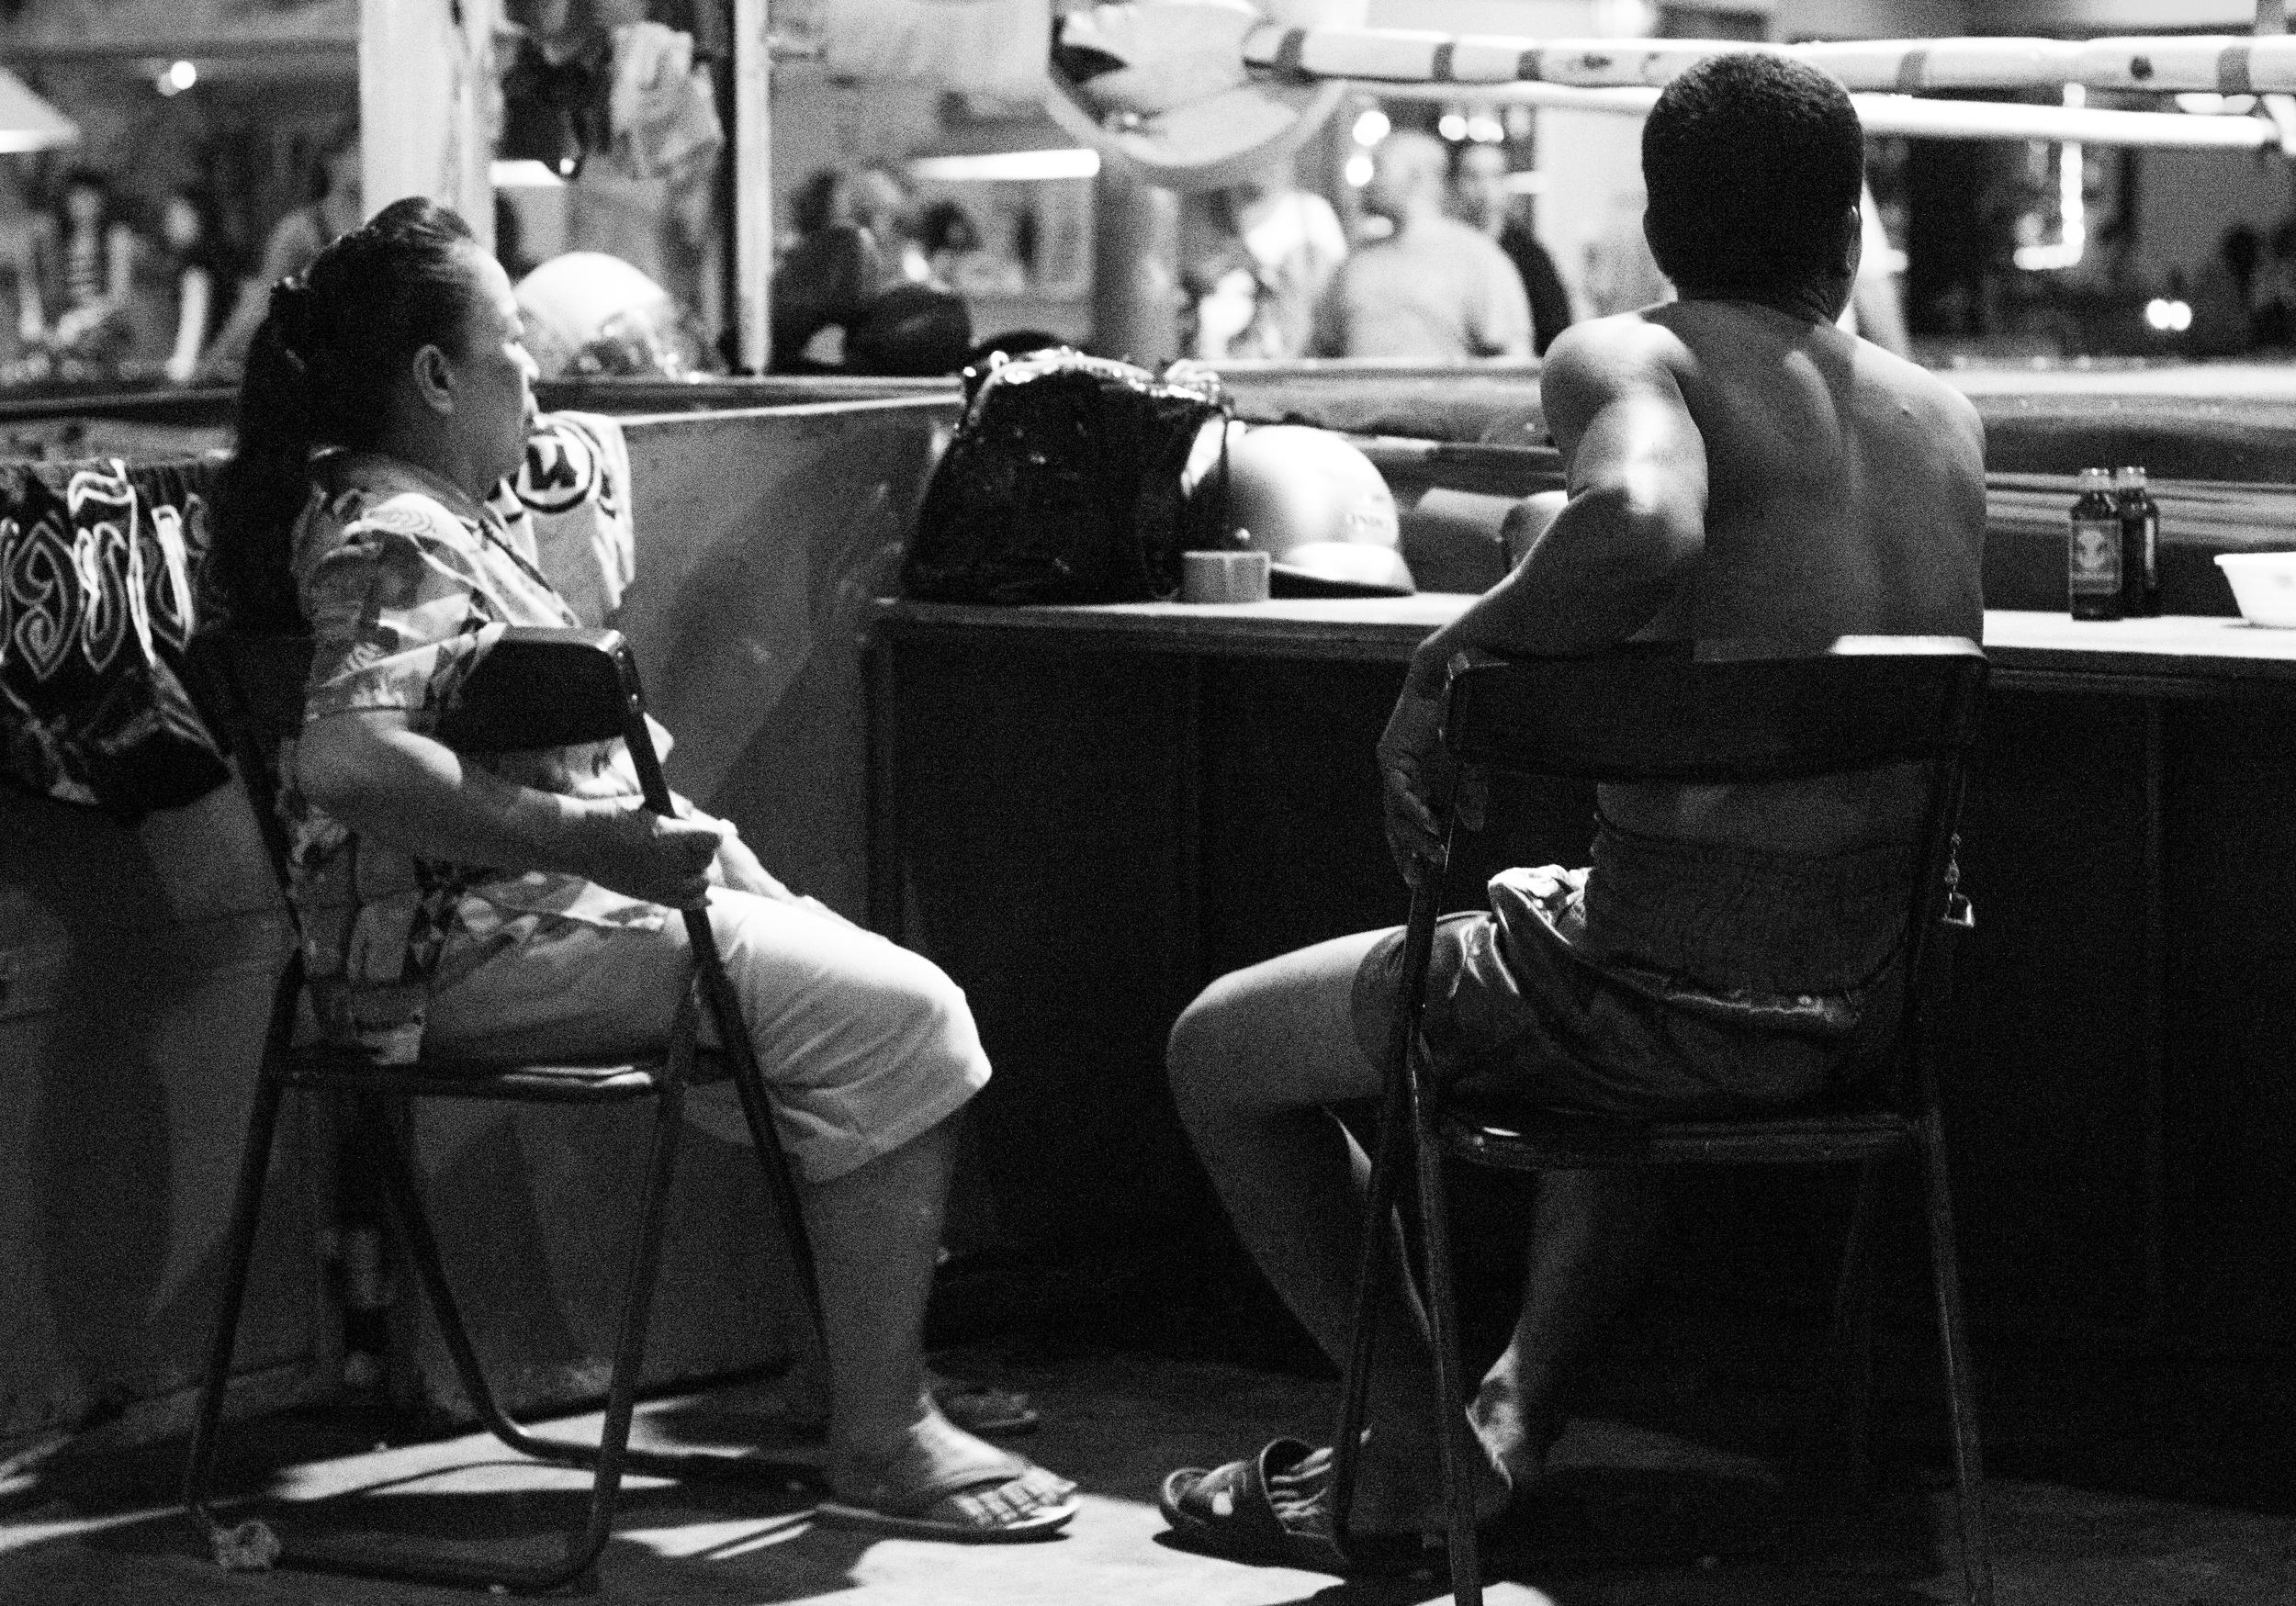 Waiting Game (August 9, 2014 - Chiang Mai, Thailand)